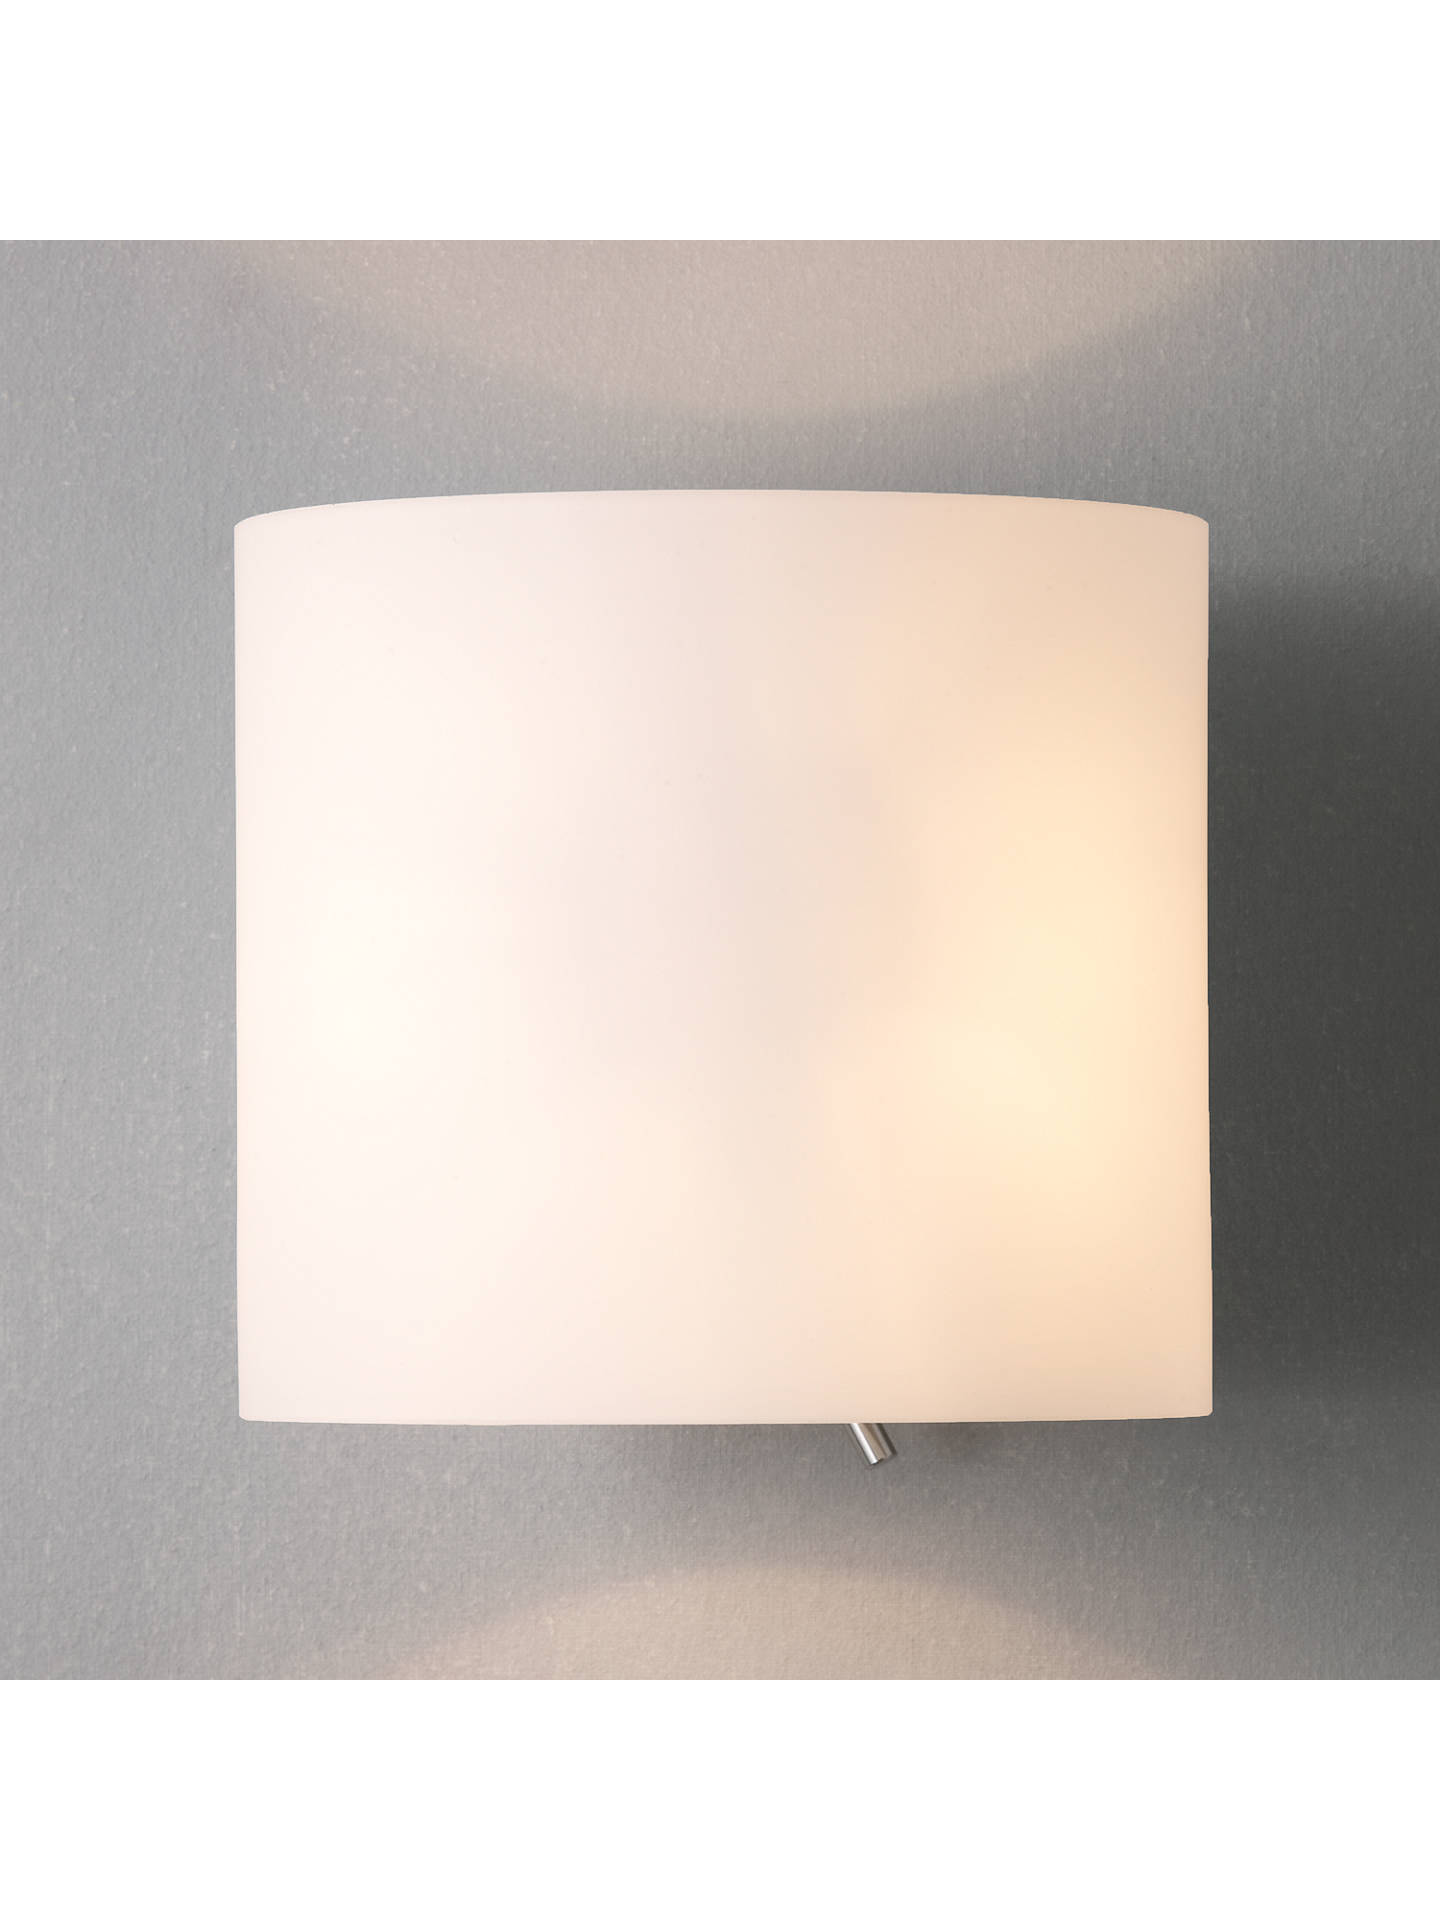 Astro Luga Wall Light